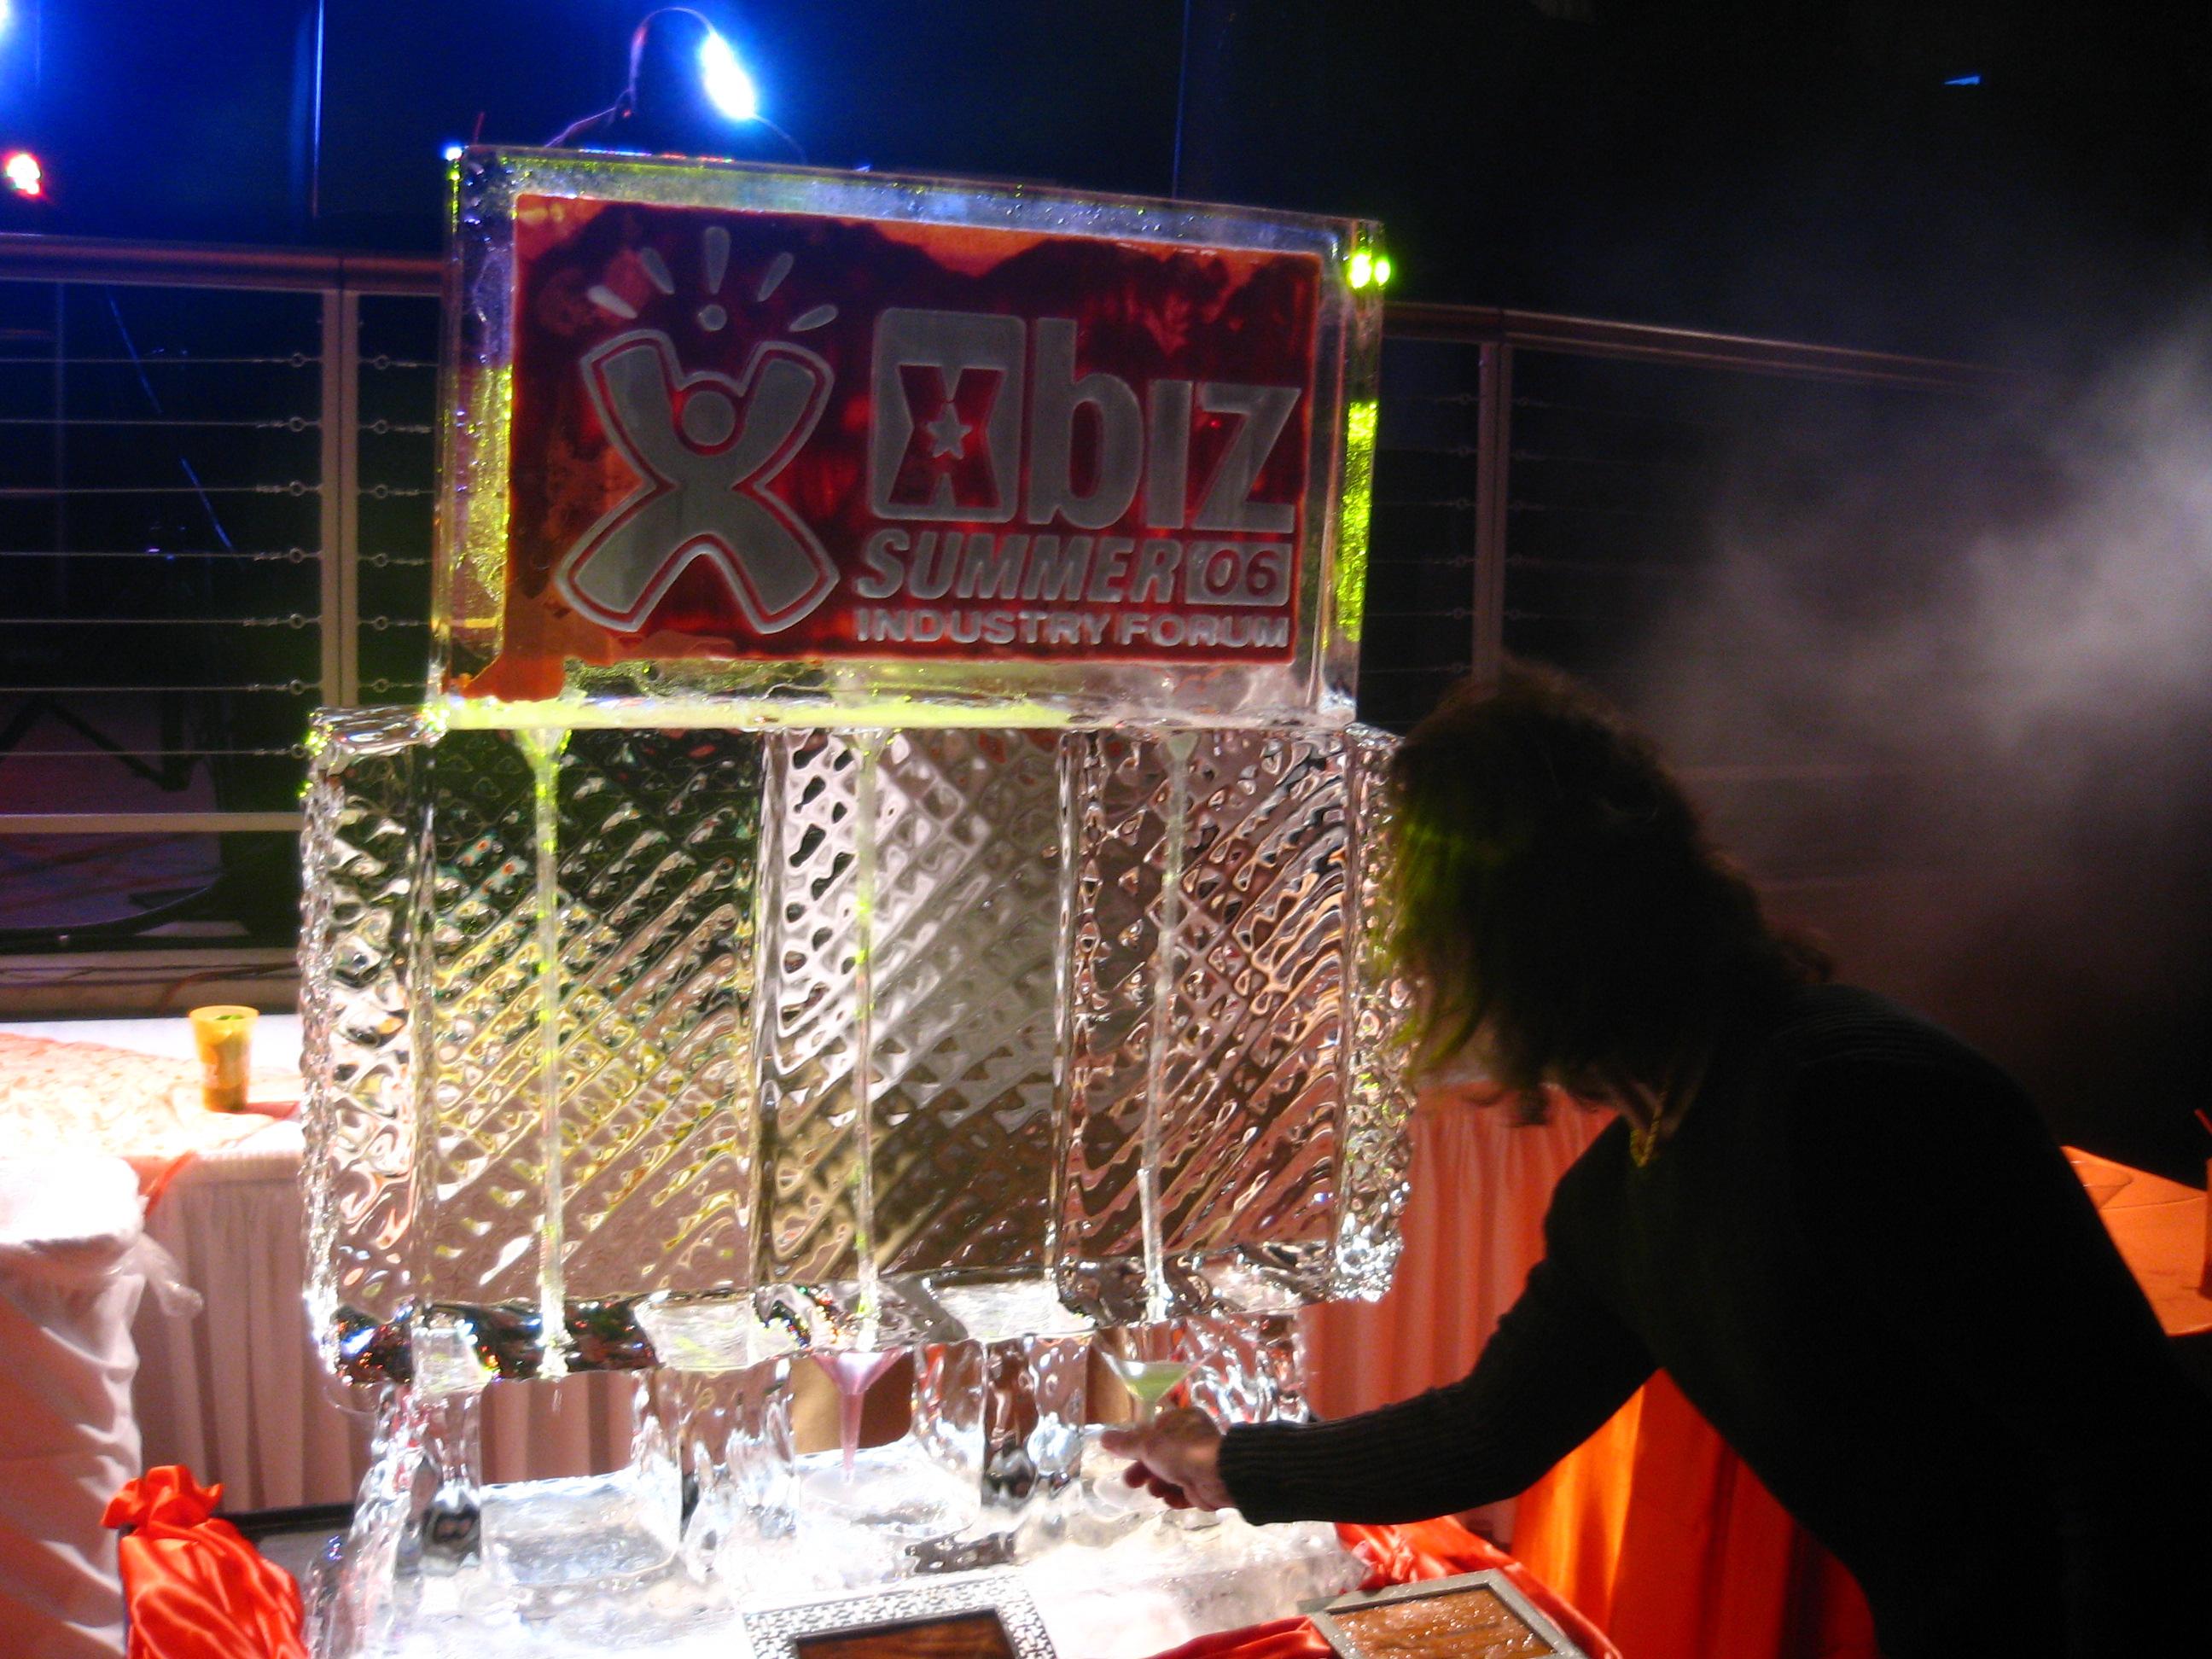 XBiz Ice Bar